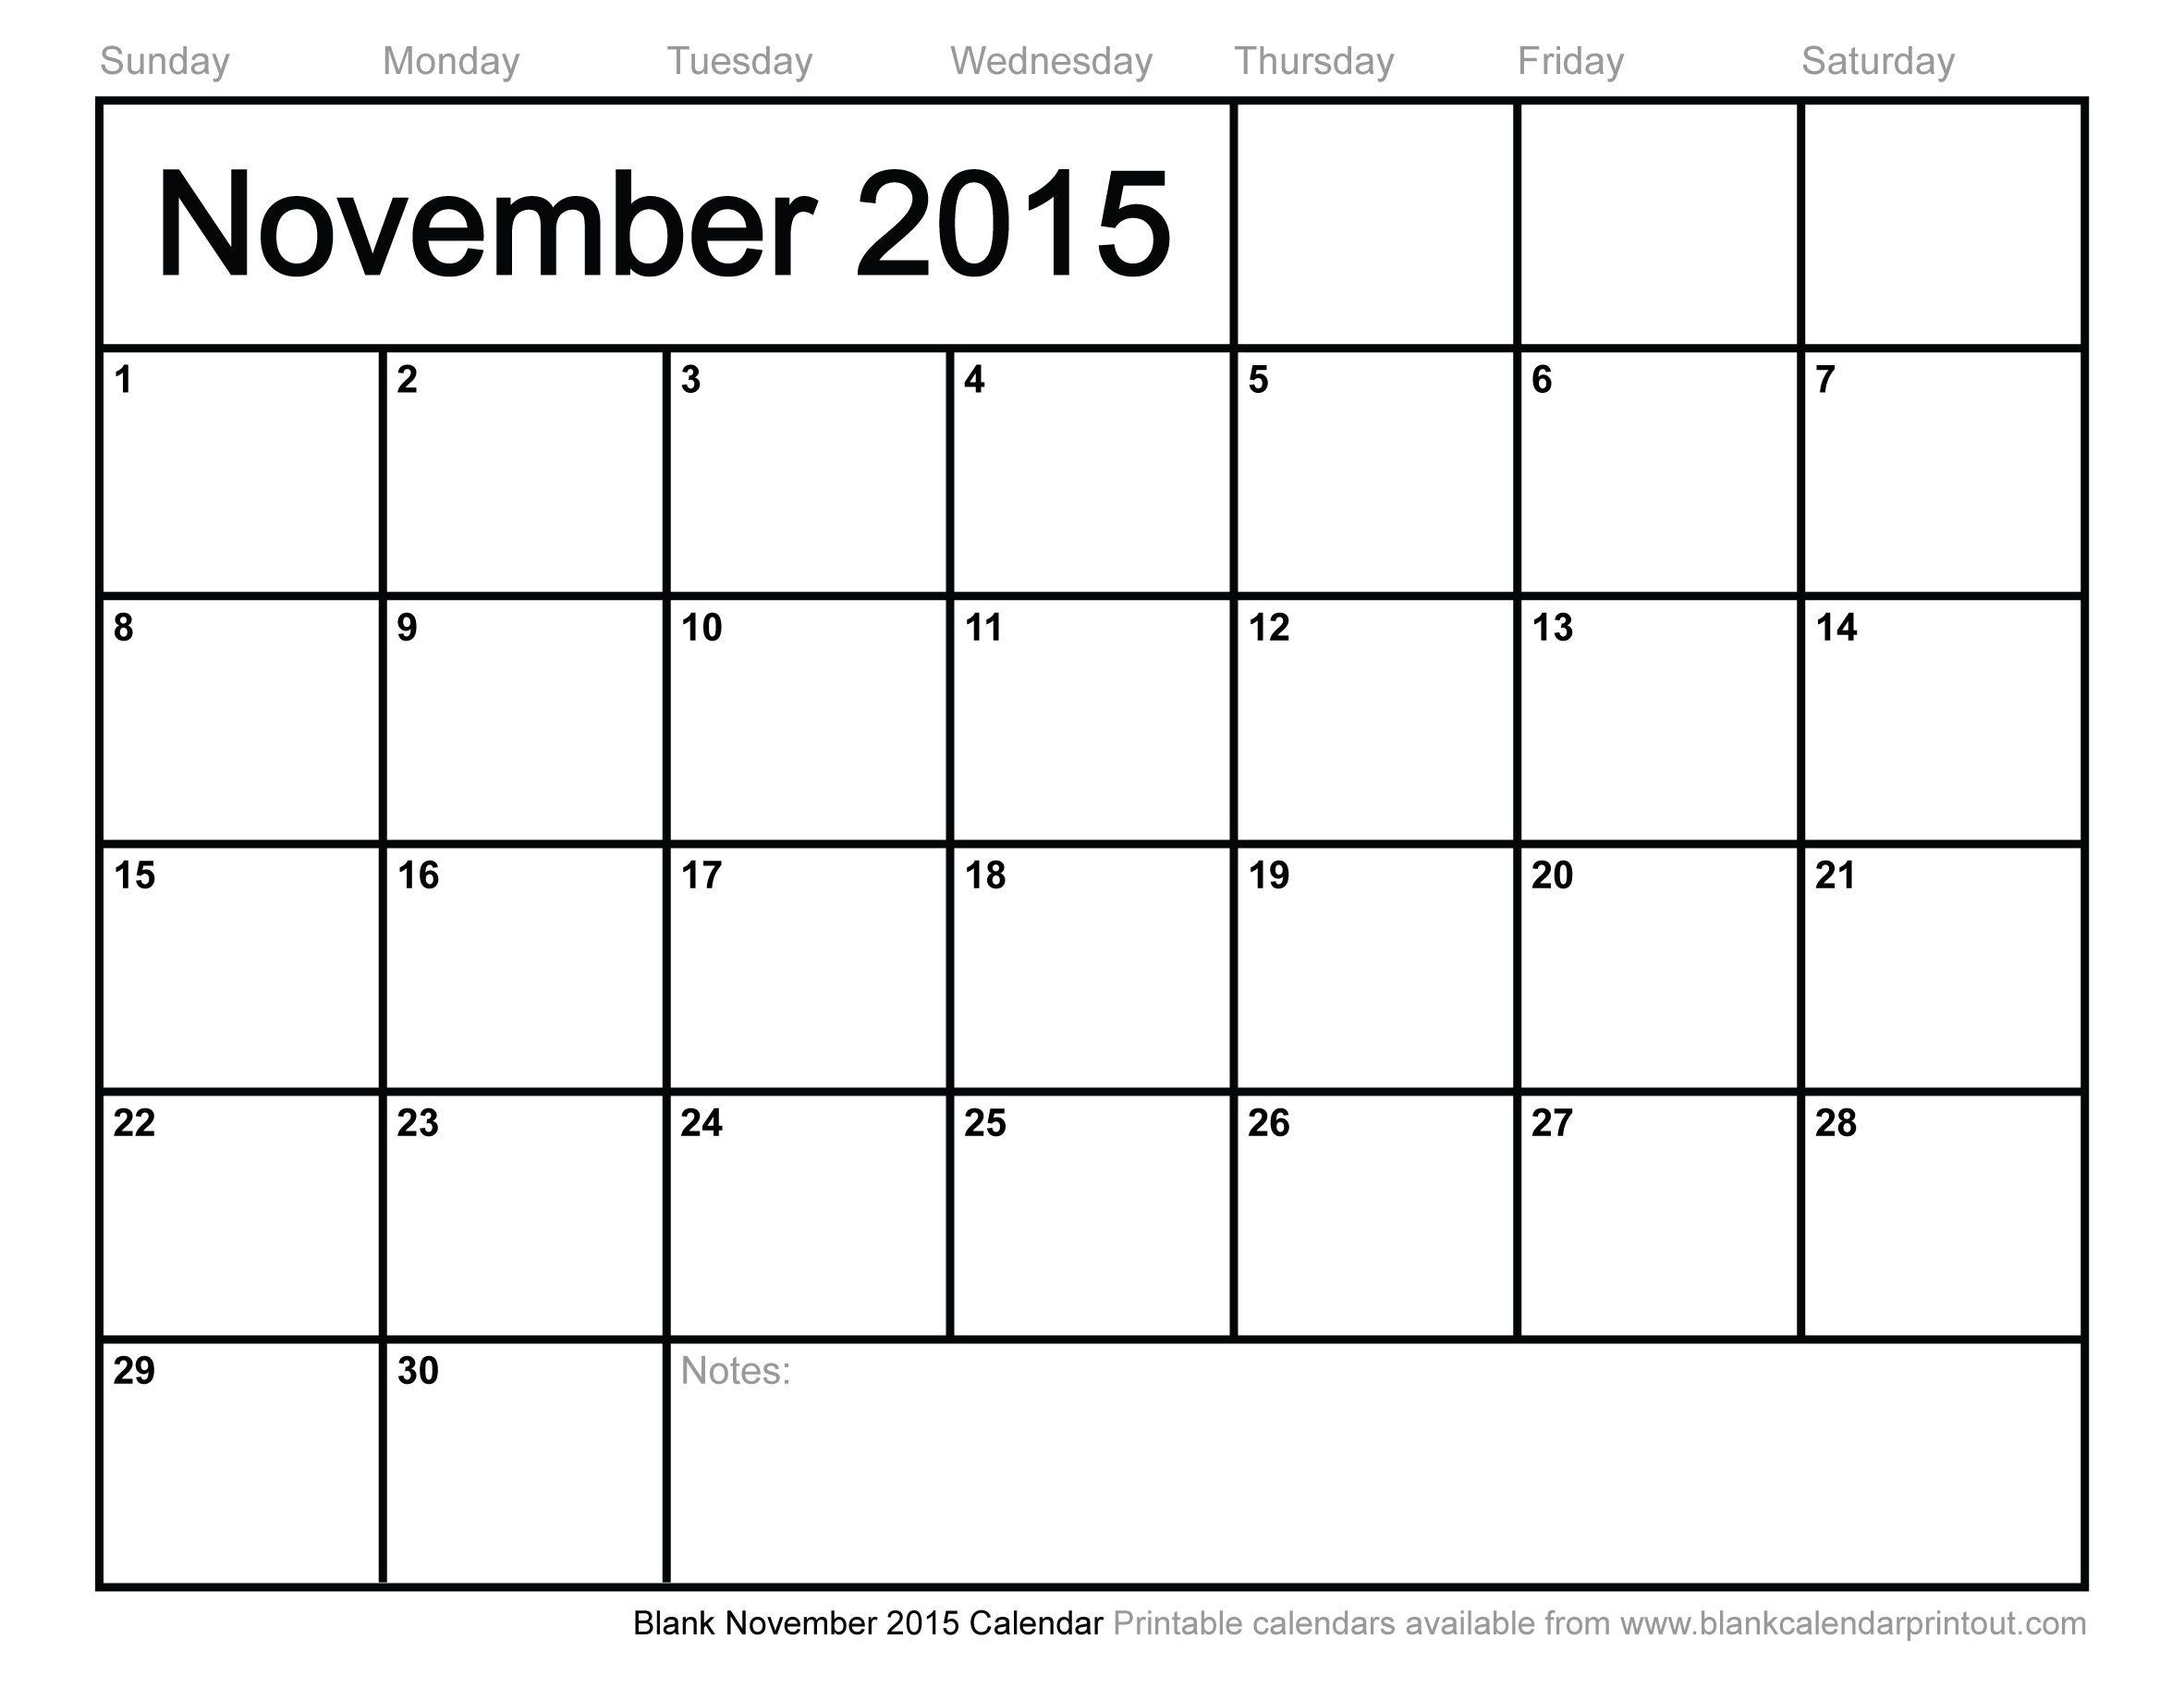 Blank Calendar Nov 2015 – Printable Editable Blank